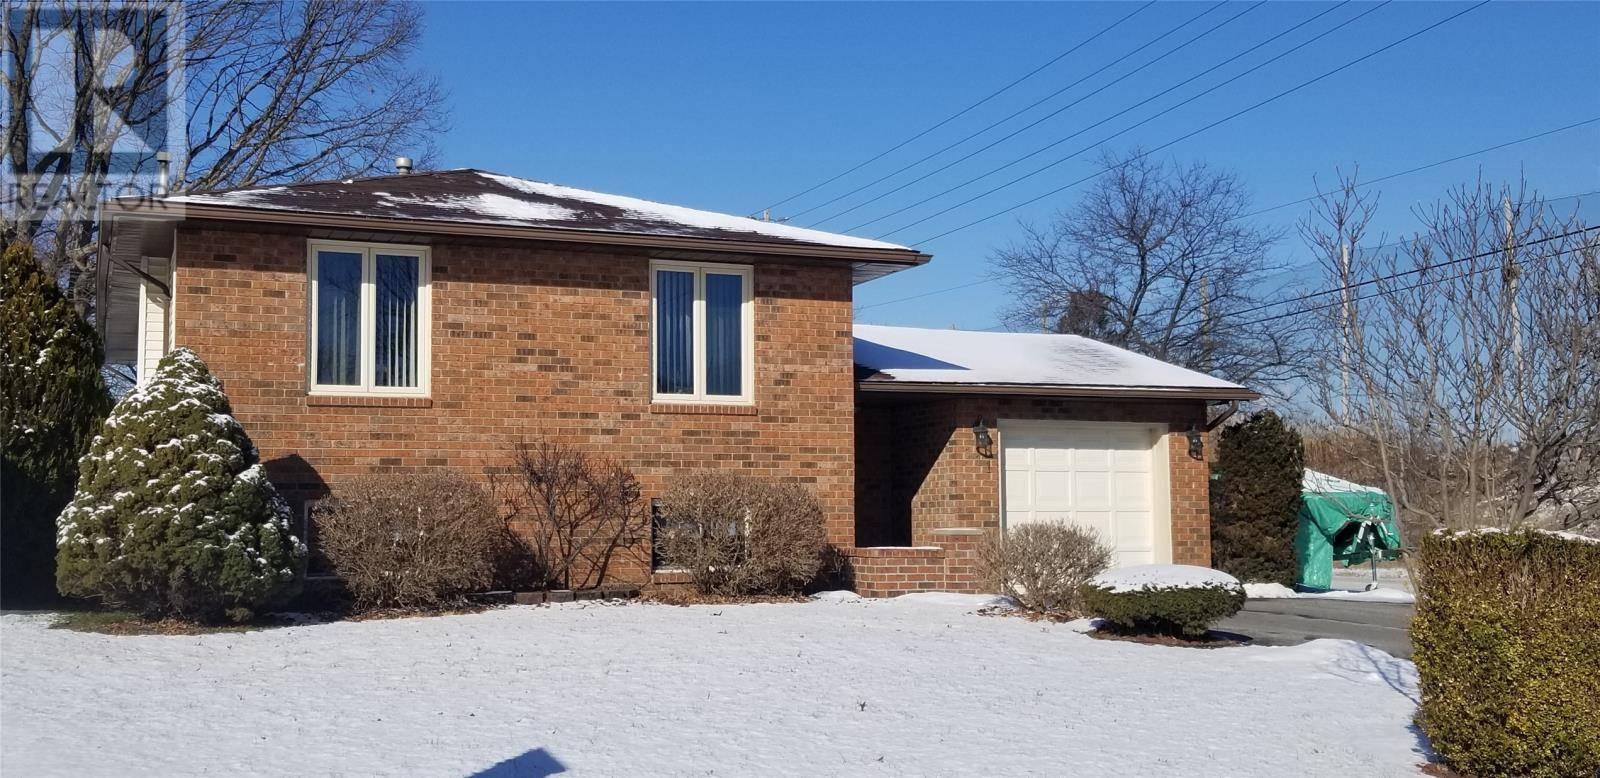 House for sale at 111 Ramblewood  Lasalle Ontario - MLS: 20002135